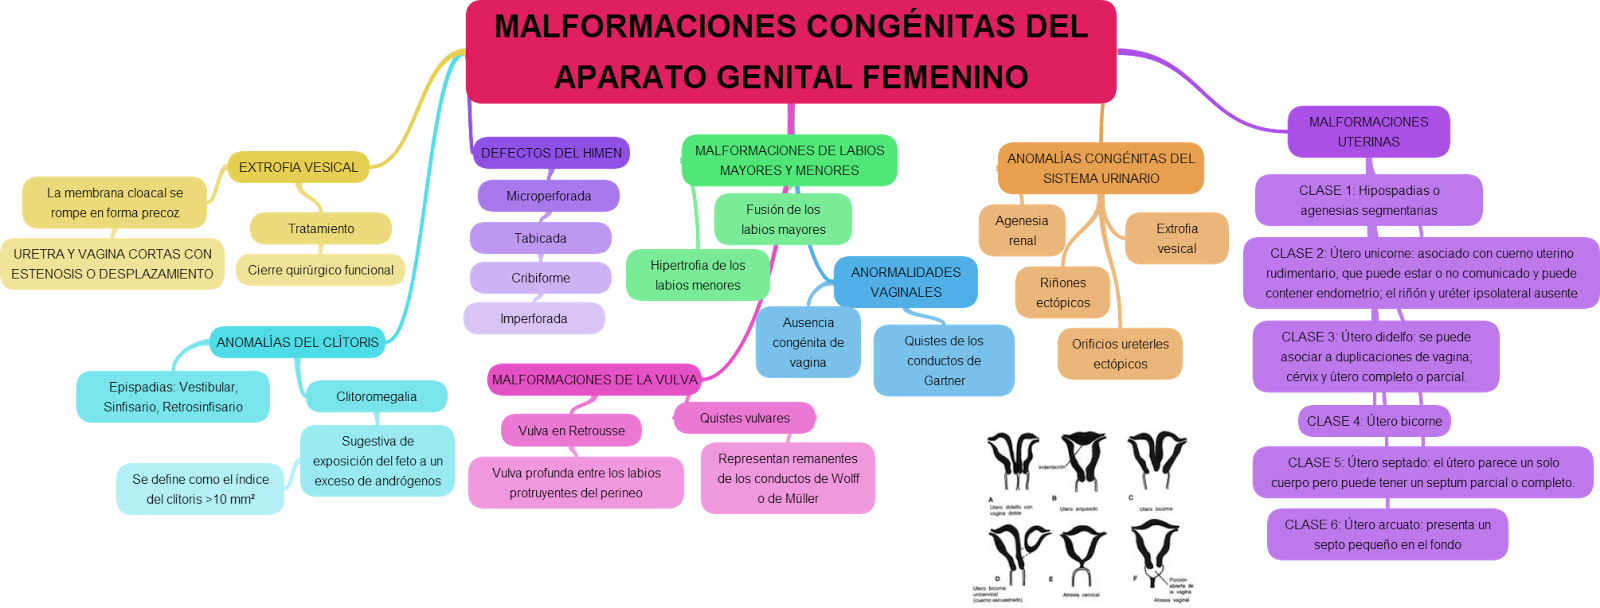 agenesia congenita uterina